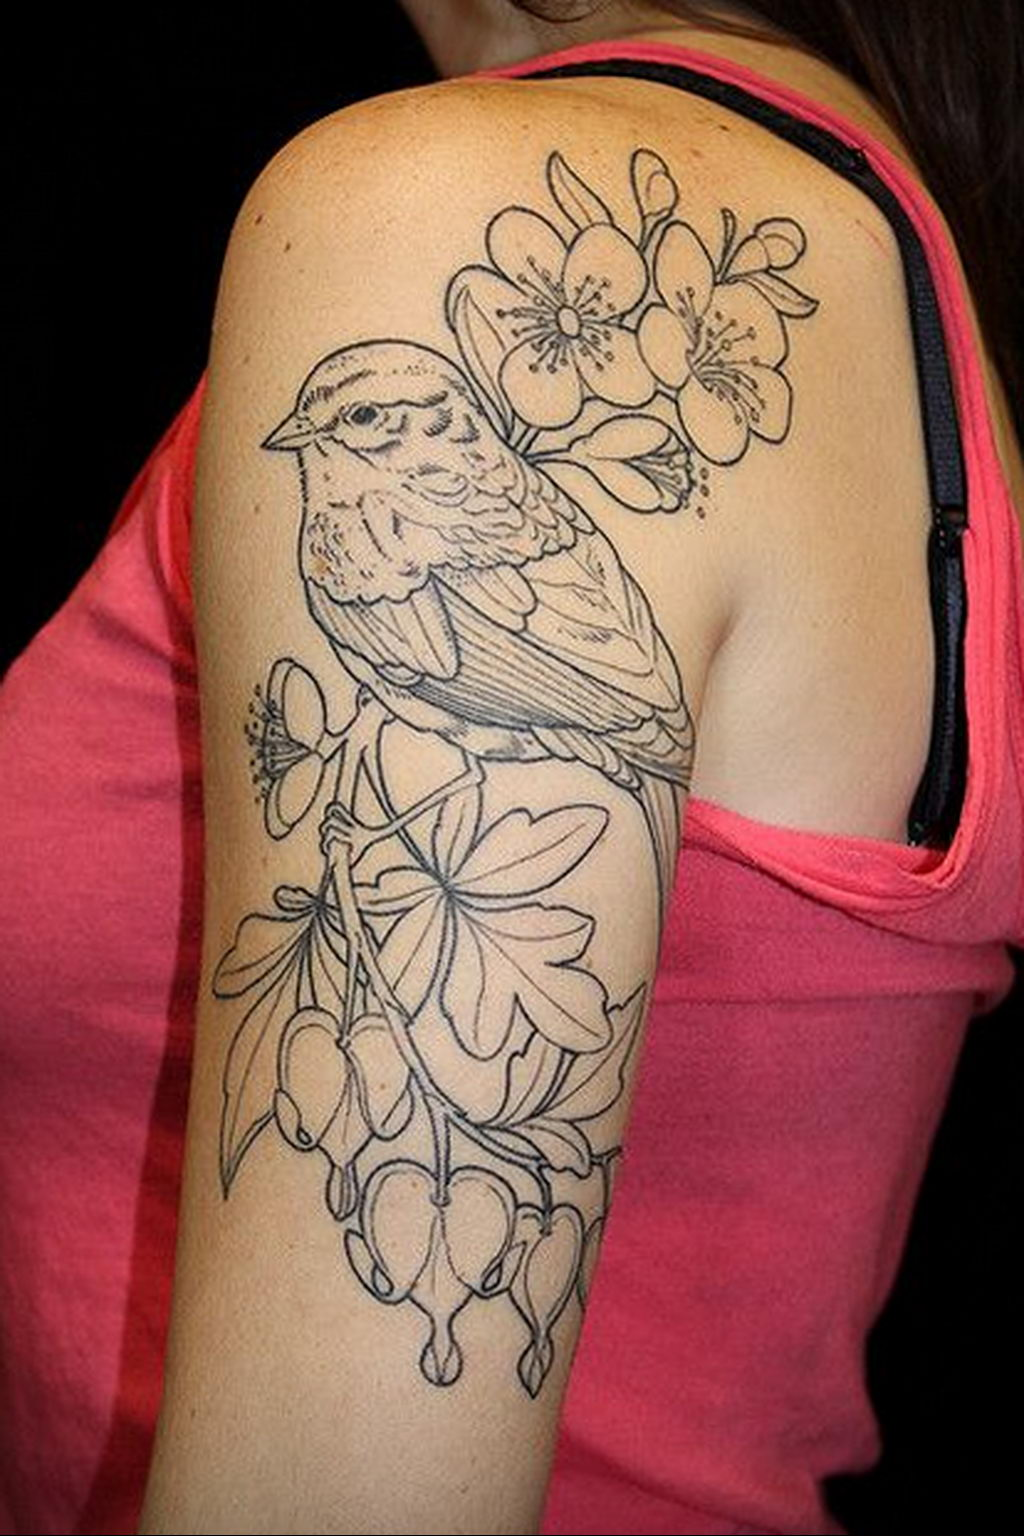 Фото тату про любовь рисунок Птица 03.02.2020 №110 -bird tattoo- tatufoto.com